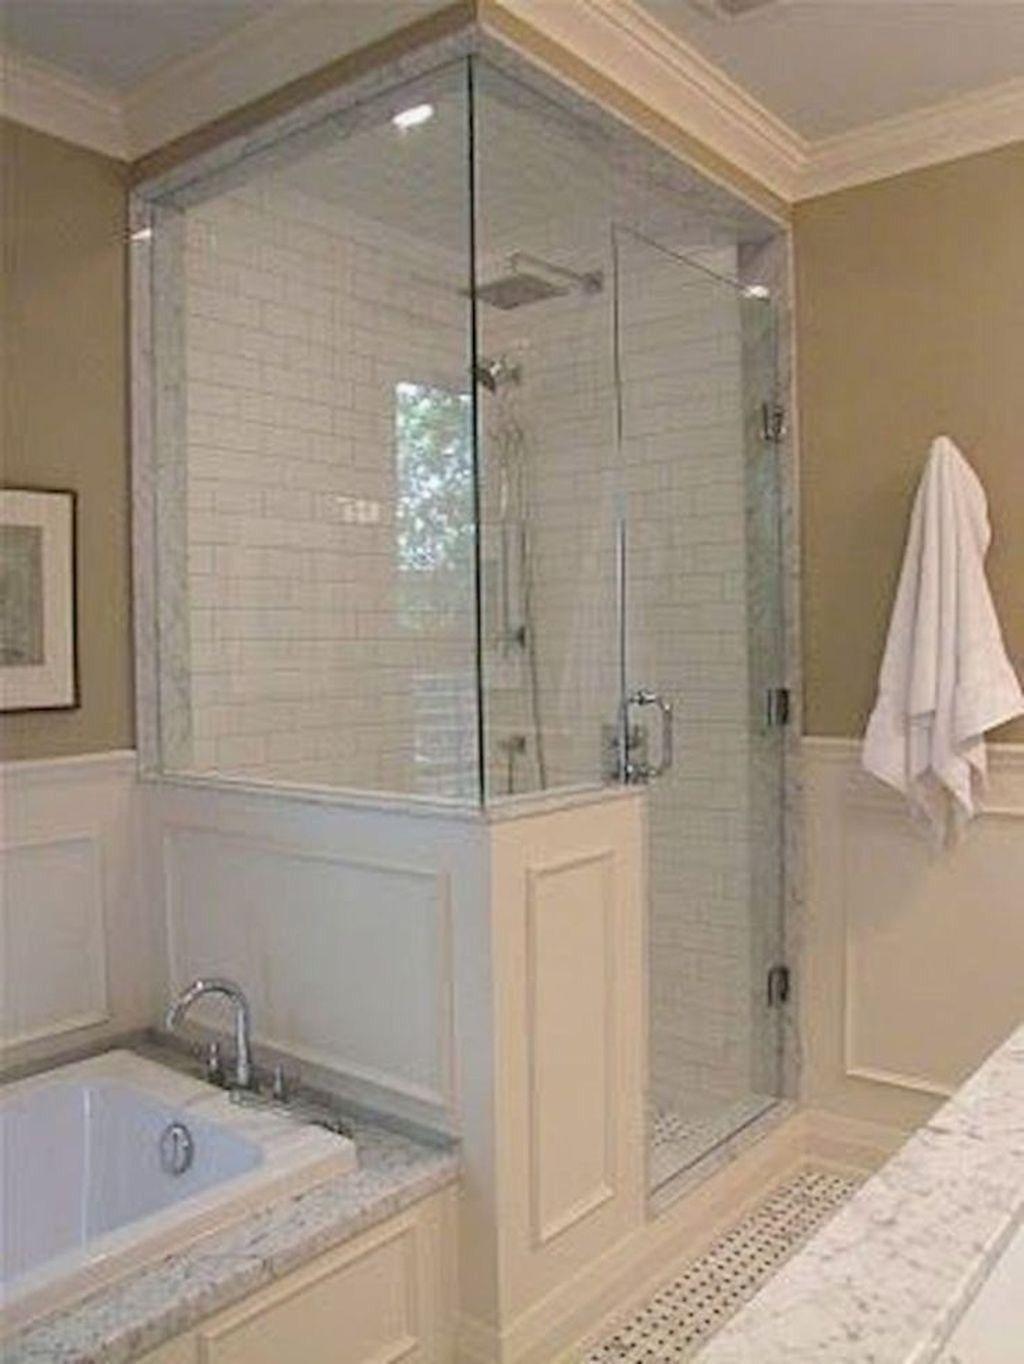 Luxury Master Bathroom Design Ideas Frugal Living In 2020 Small Master Bathroom Bathroom Remodel Master House Bathroom